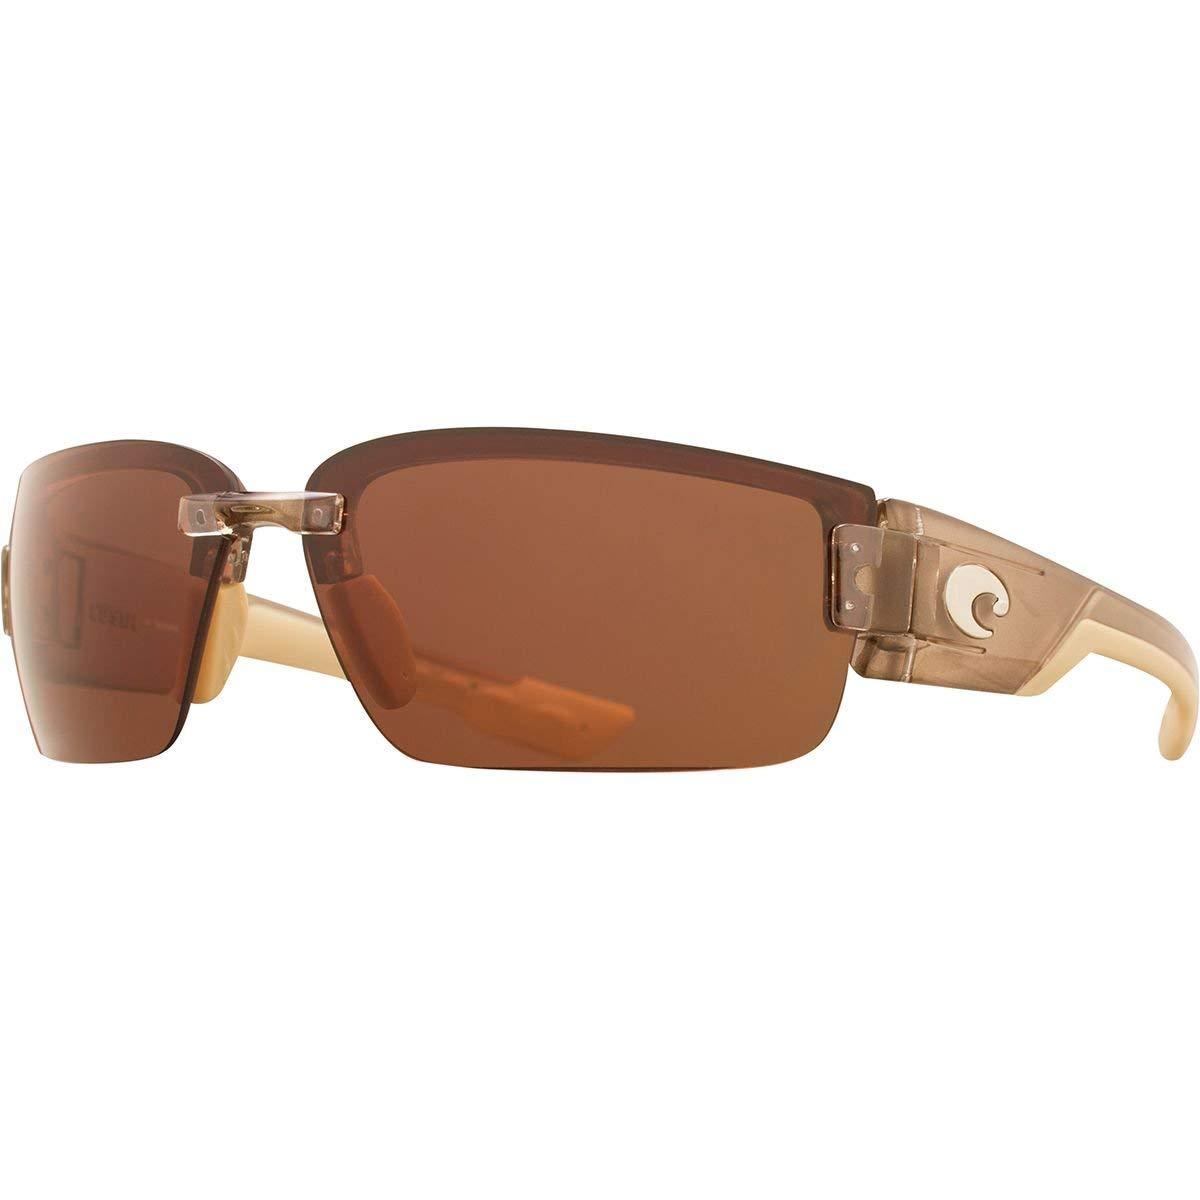 Plastic Frame Crystal Bronze Lens Costa Del Mar Sunglasses Zane Polarized Copper 580P Polycarbonate